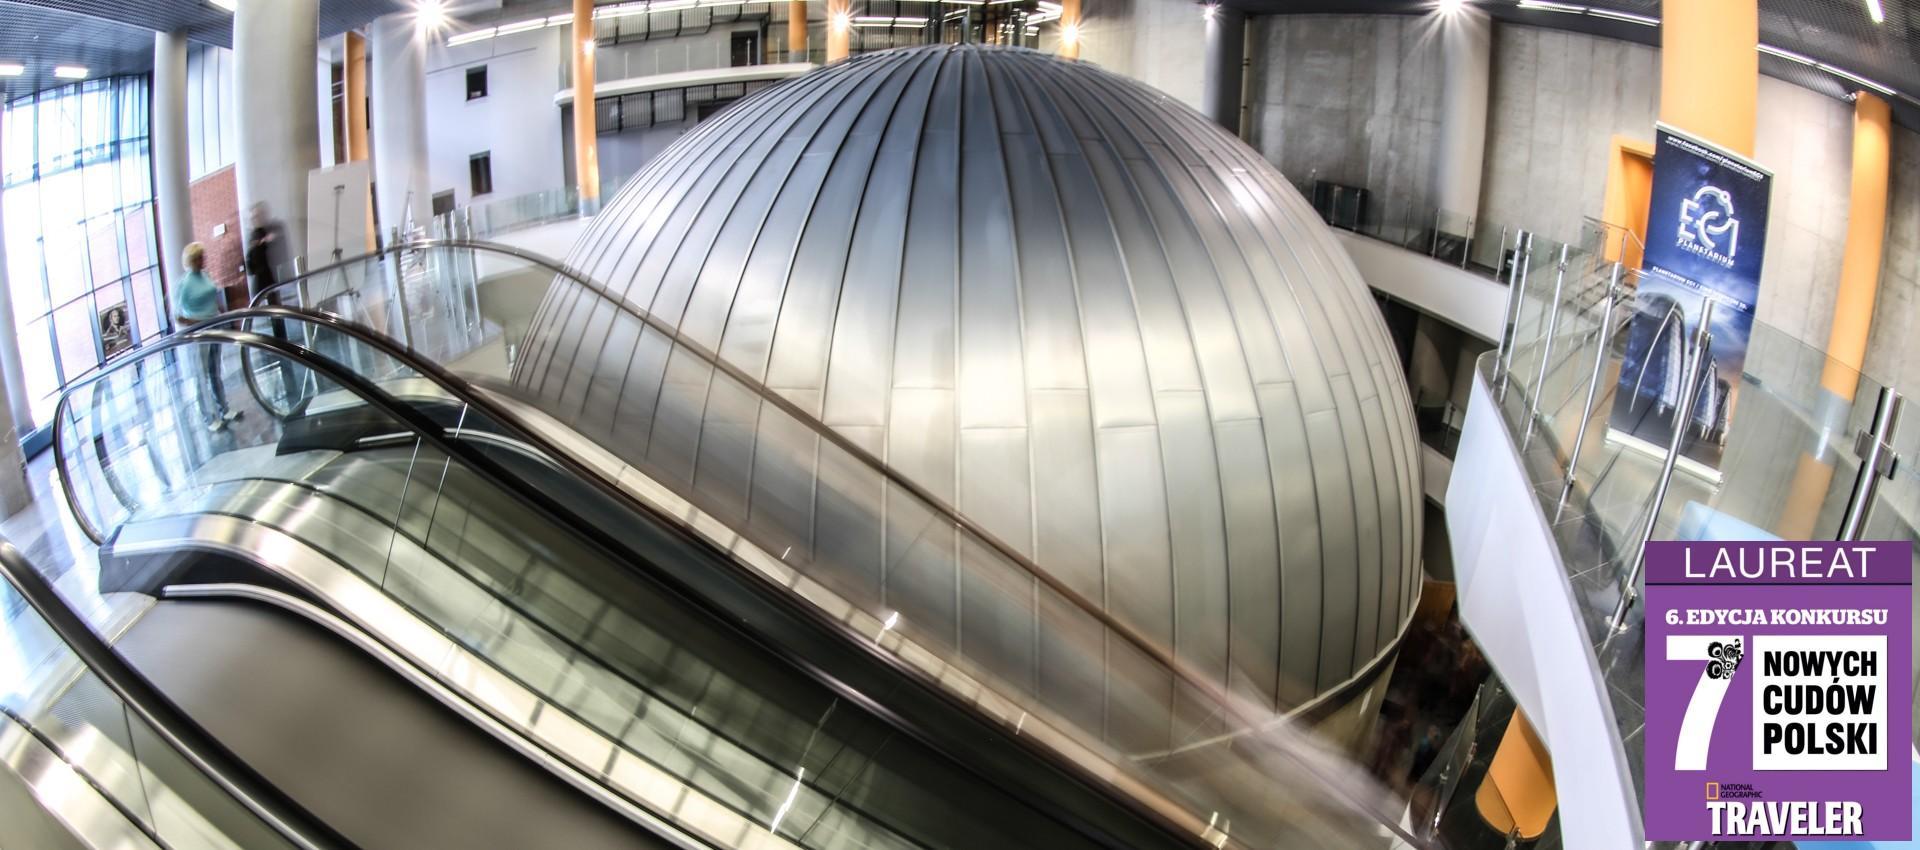 Planetarium EC1 ponownie otwarte!